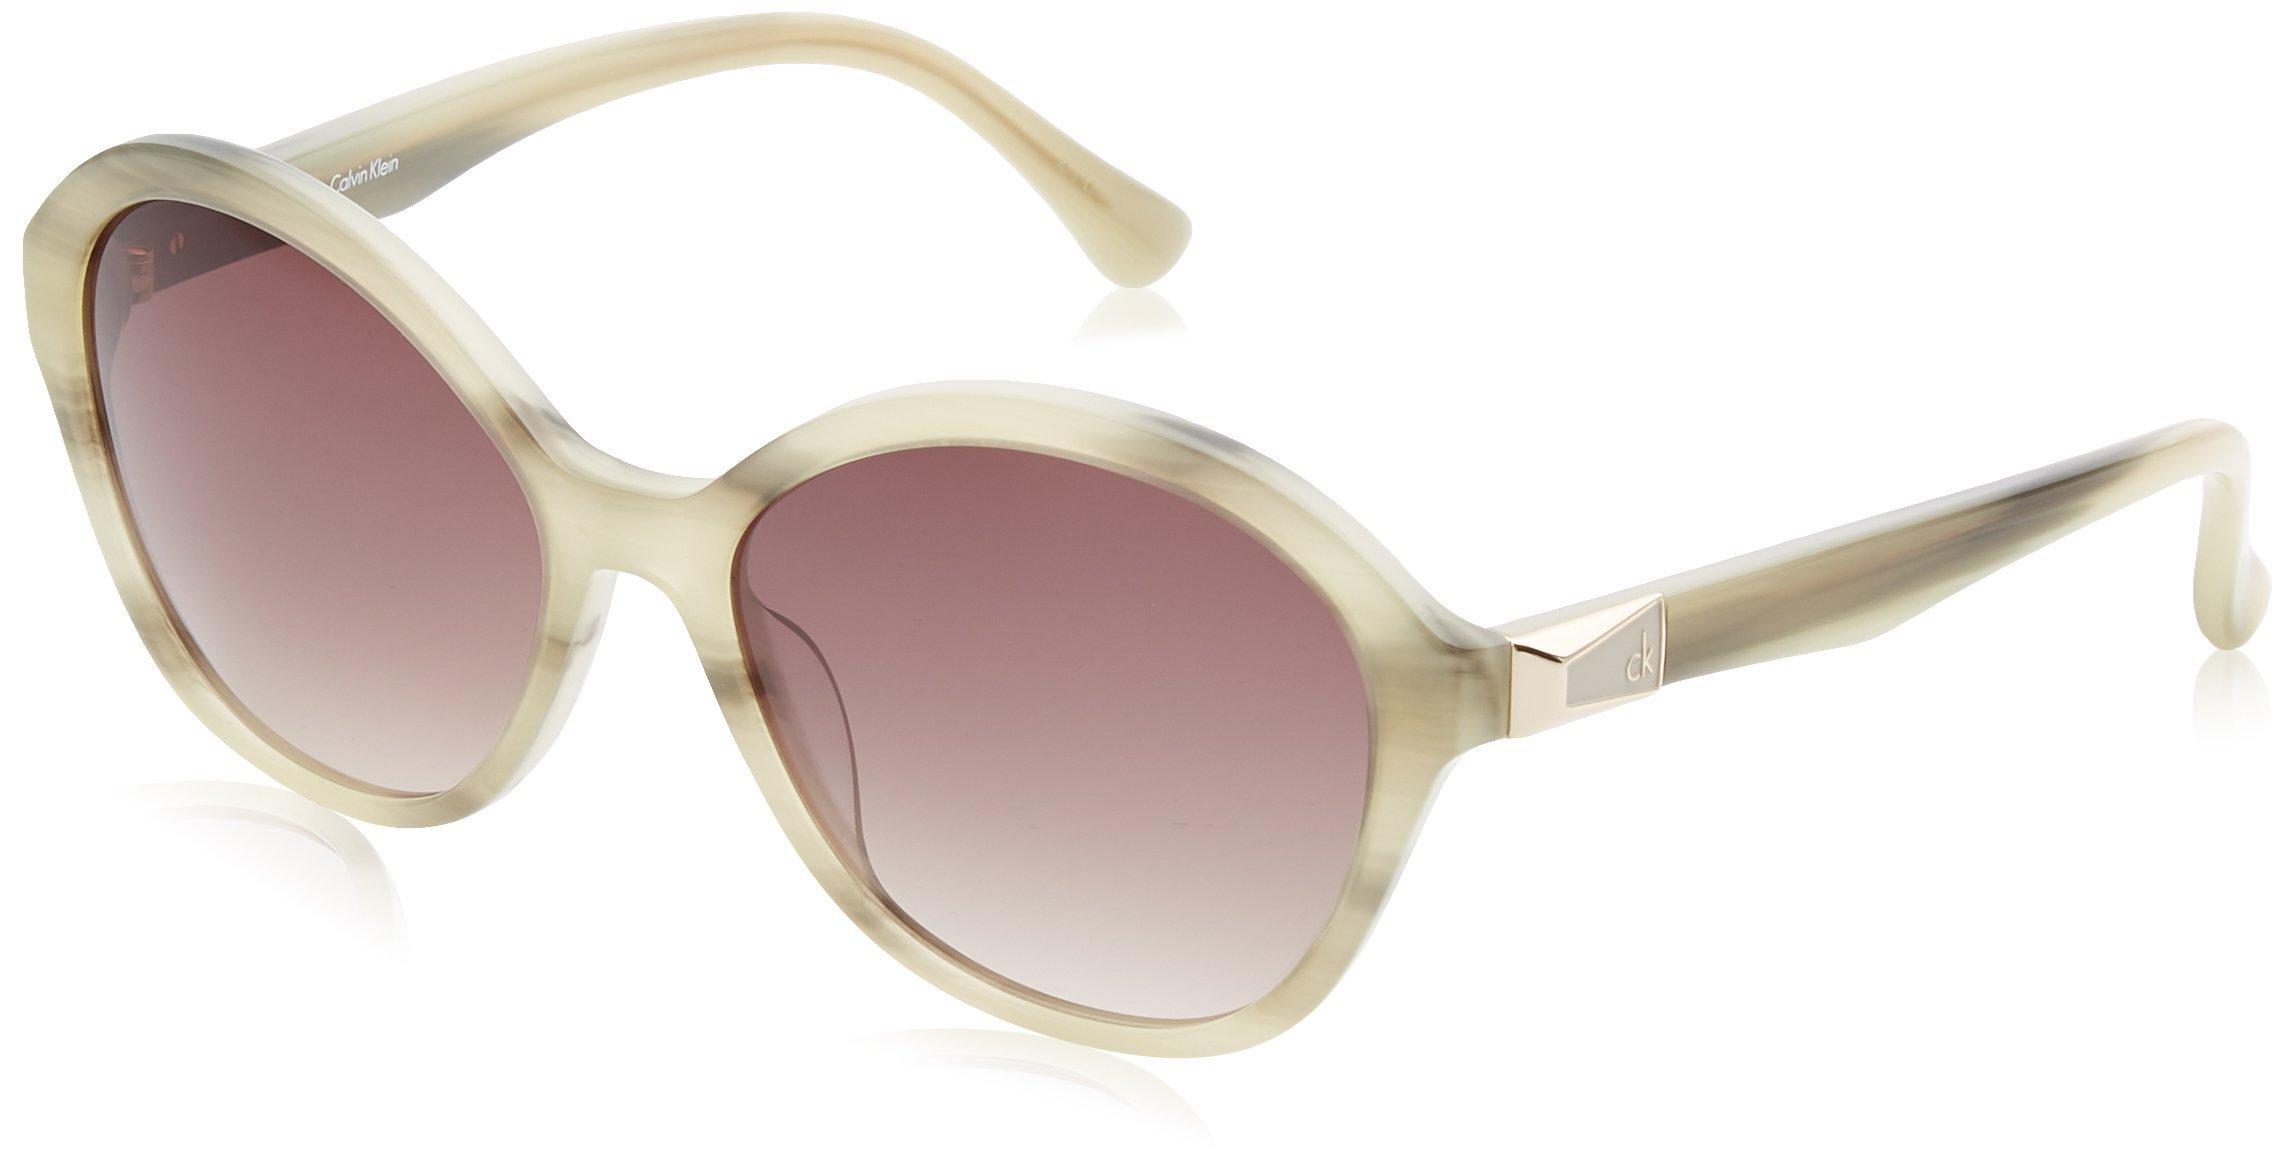 c46bf6003a ▷ Ofertas Calvin Klein Cat Eye, Gafas de Sol para Mujer, Beige, 56 ...